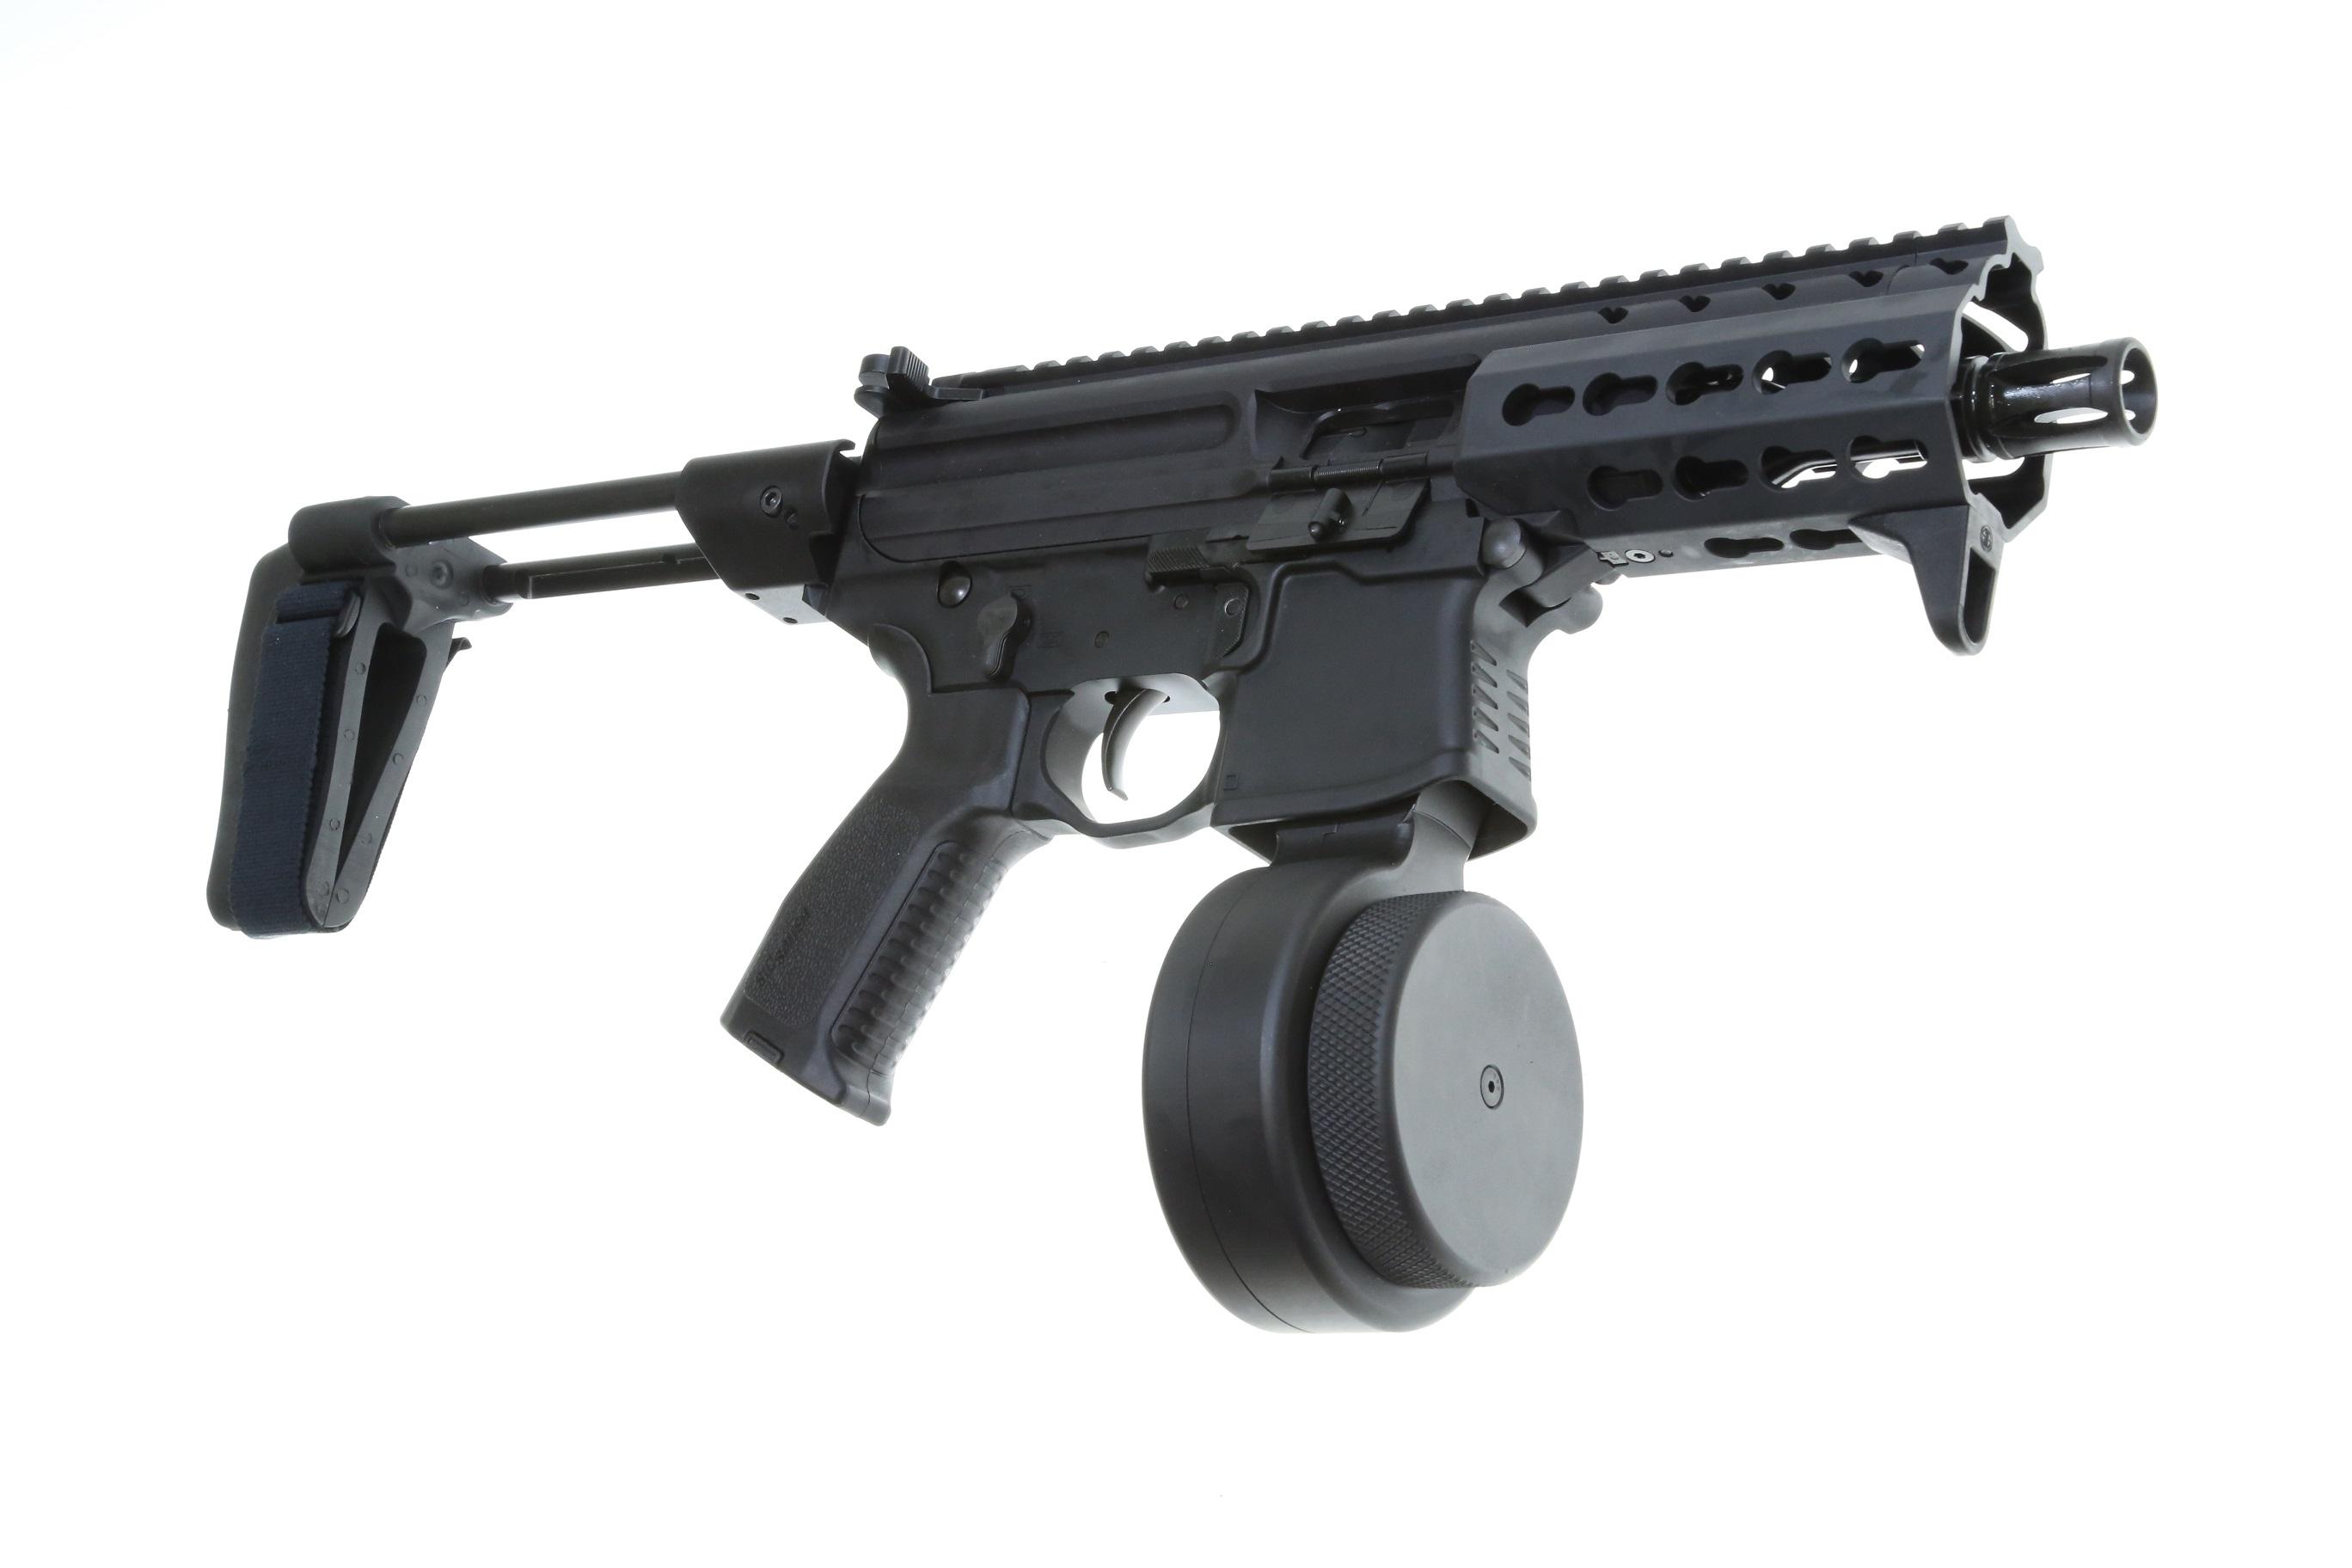 Sig Sauer MPX 9mm Pistol 4 5